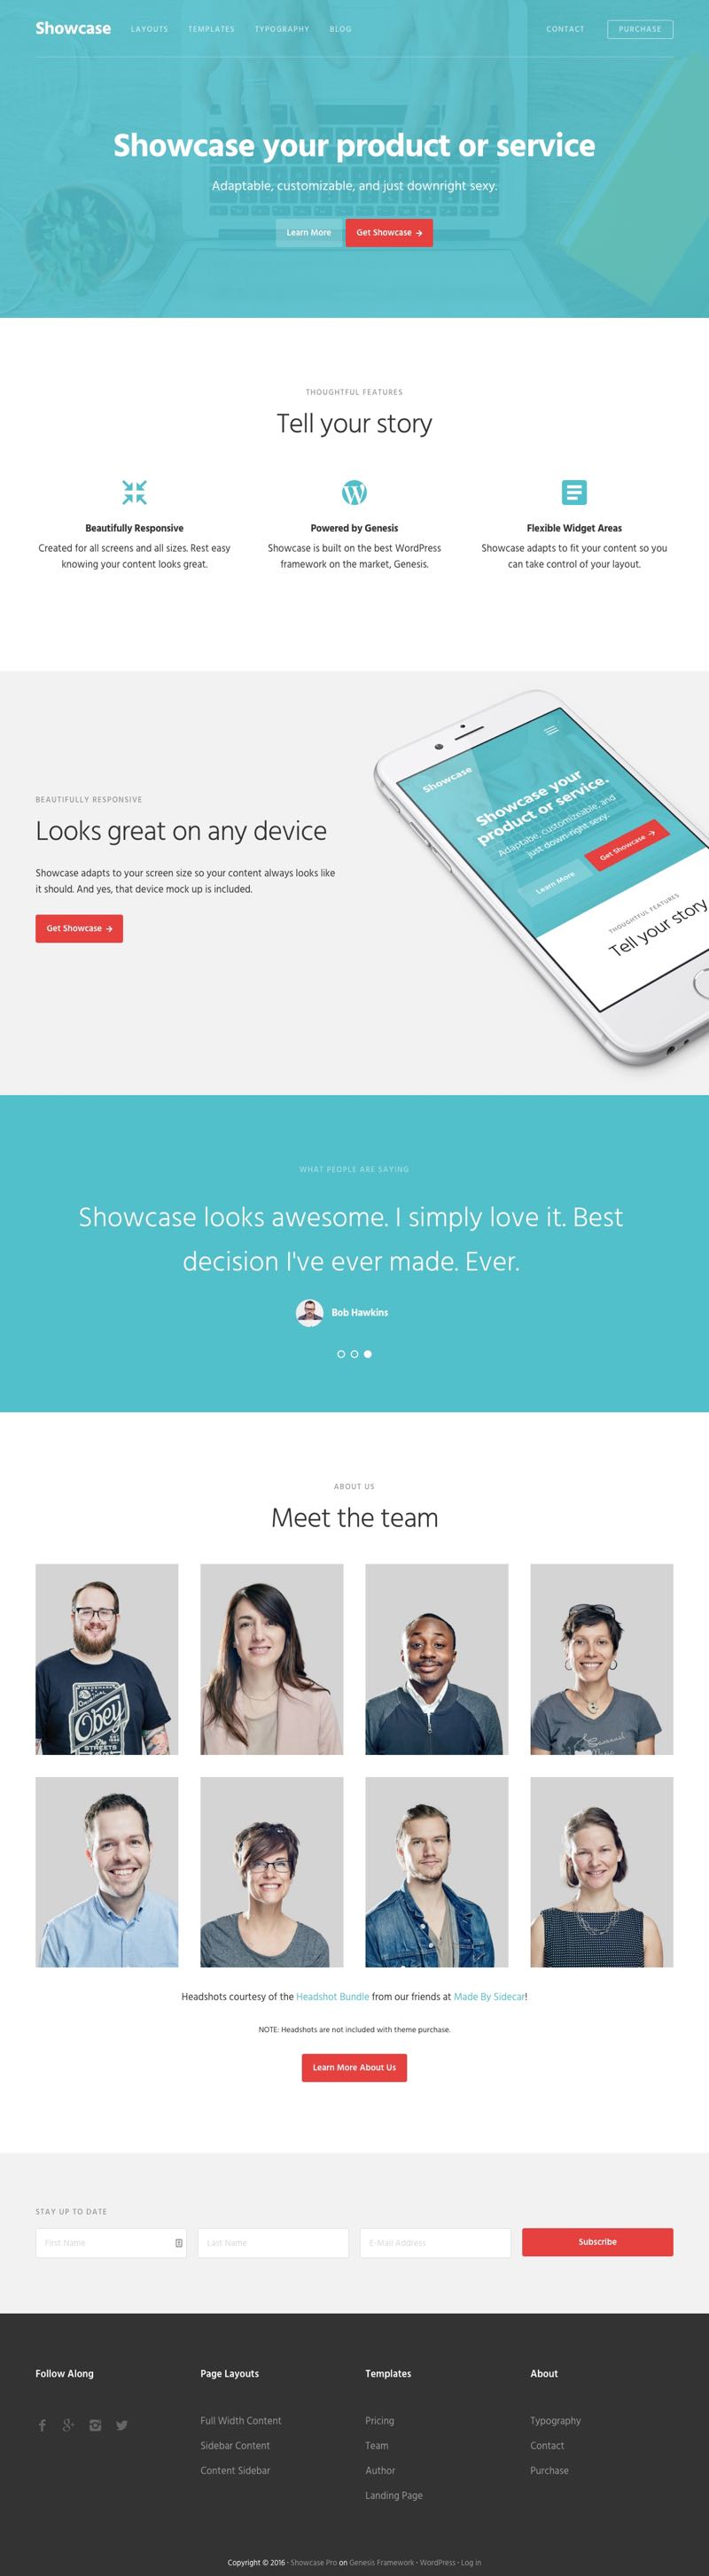 Showcase Pro WordPress Product or Services Theme